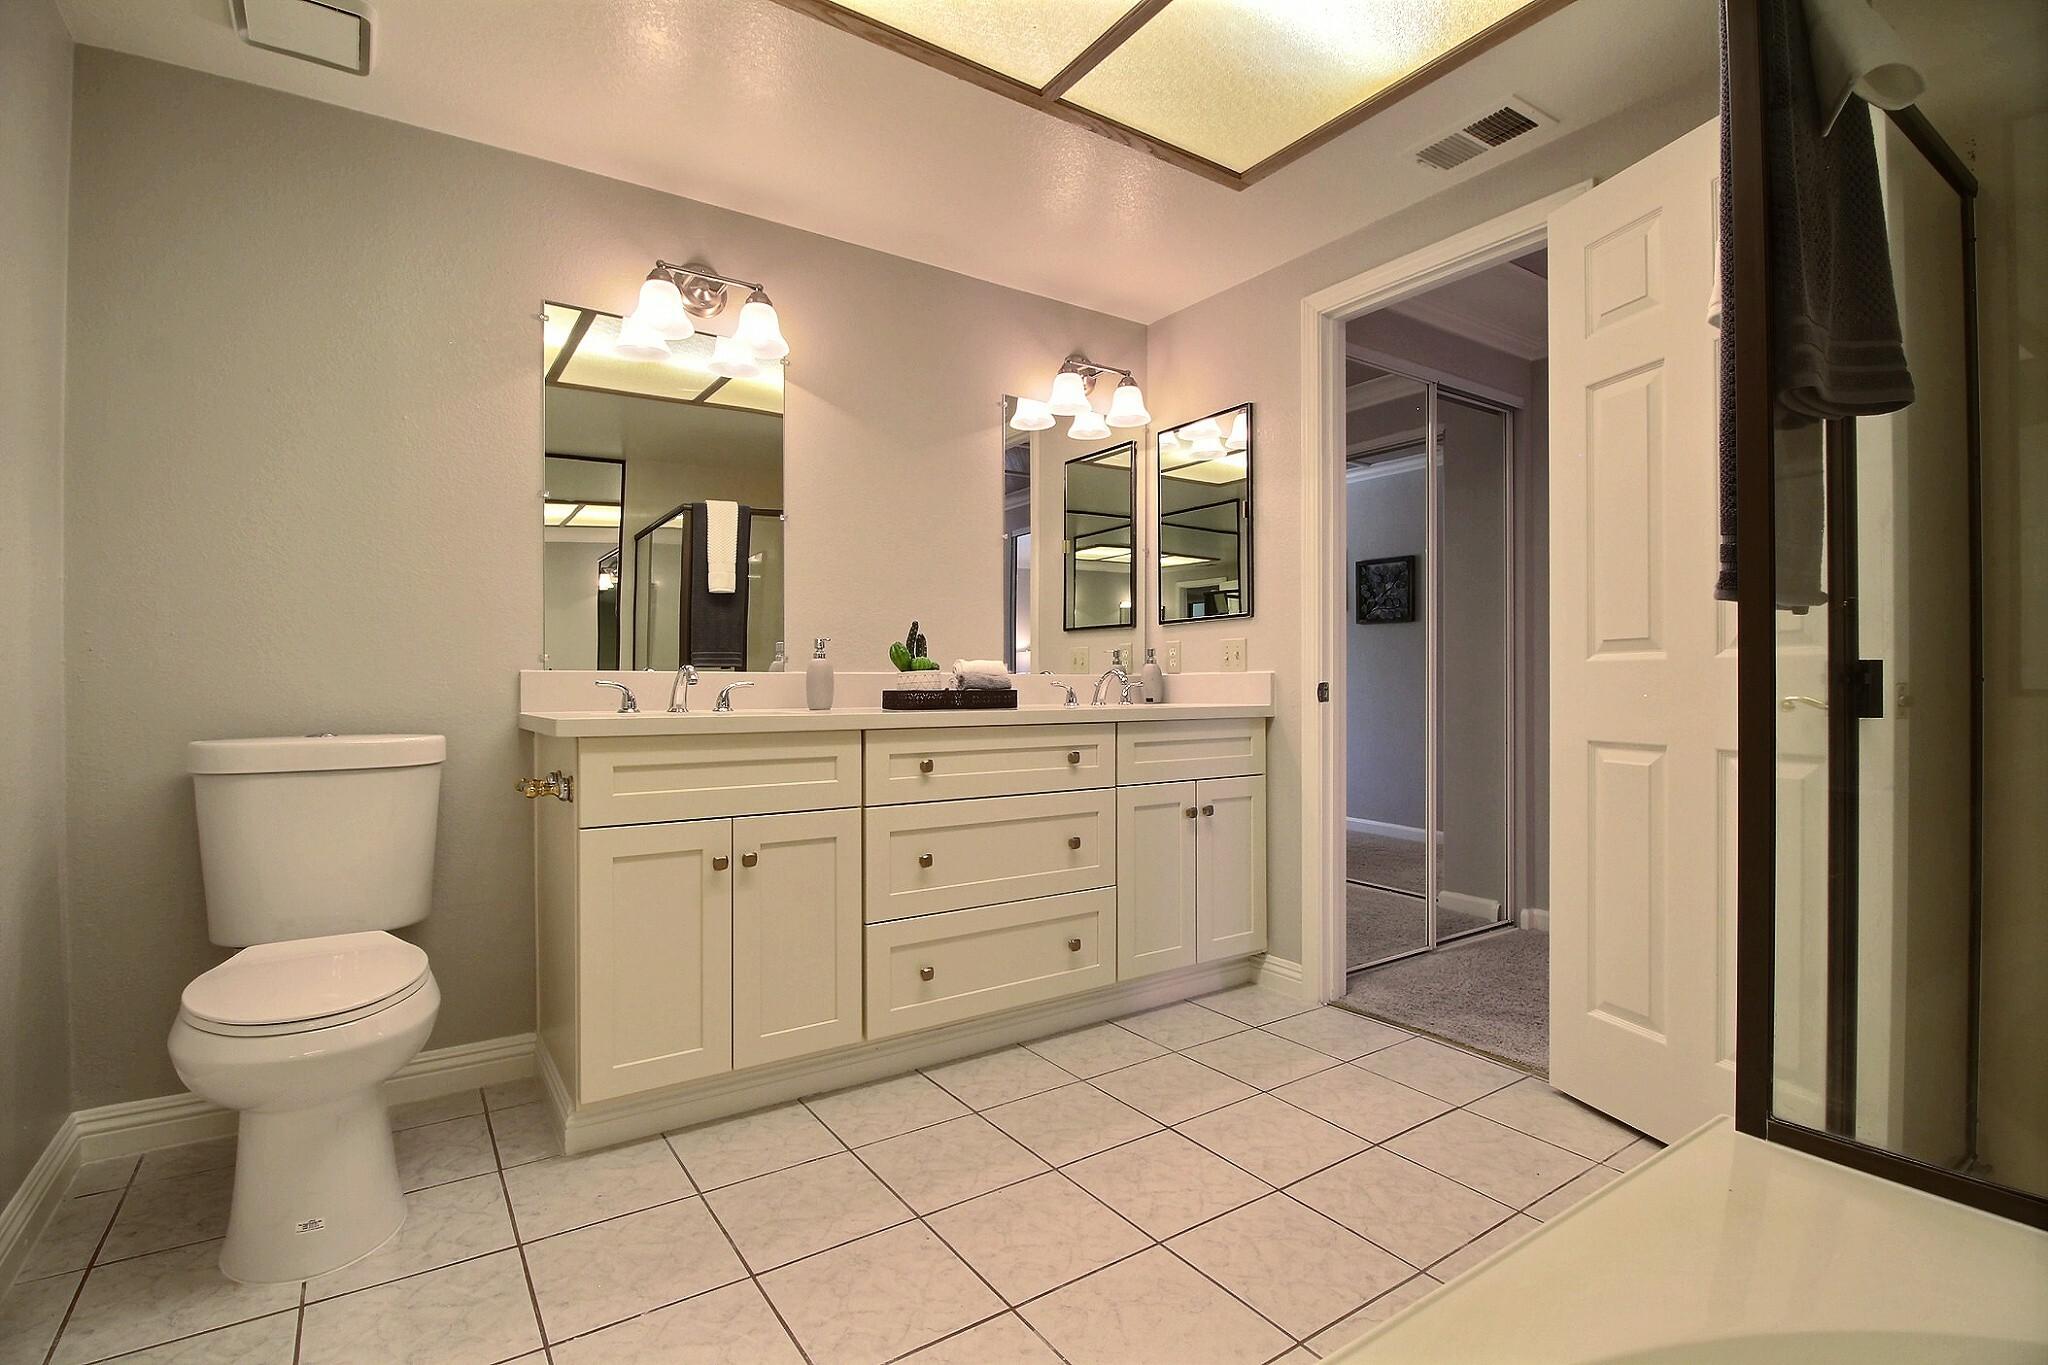 exposio_09_master_bathroom_04_2433_wildhorse_